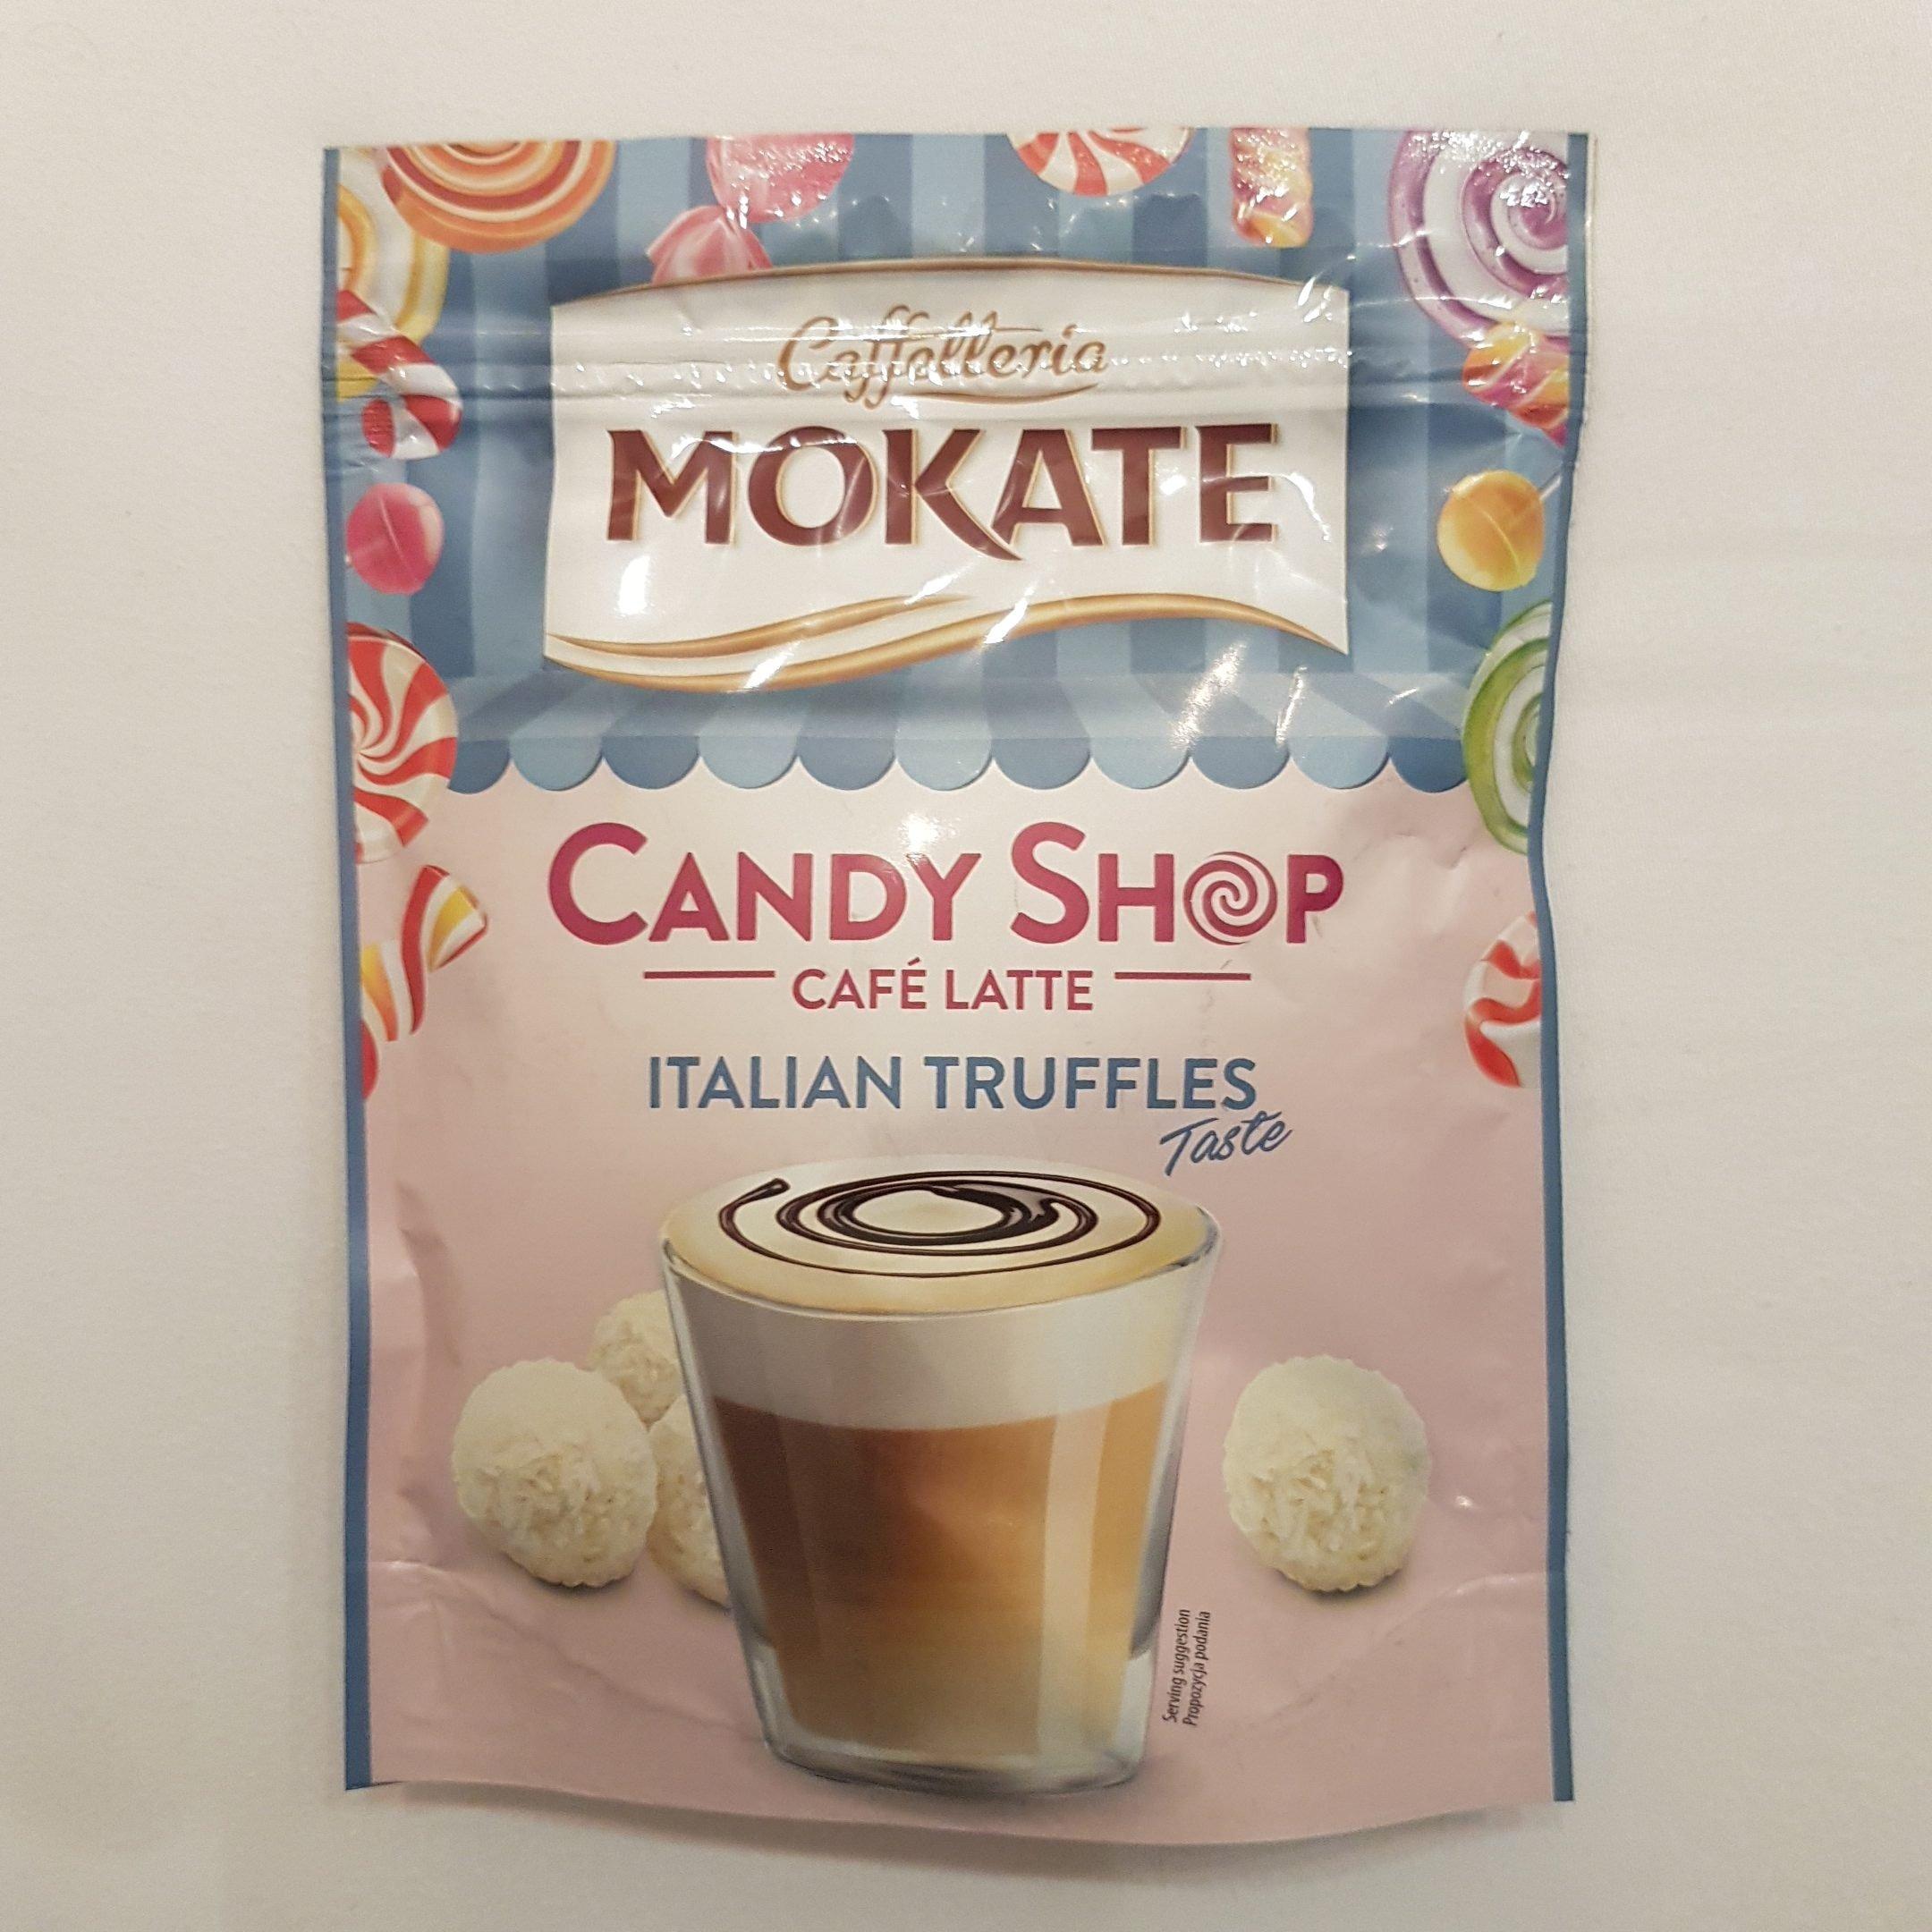 Caffetteria Mokate - Candy Shop Café Latte Italian Truffles Taste - itstartswithacoffee.com #latte #candyshop #caffetteria #mokate